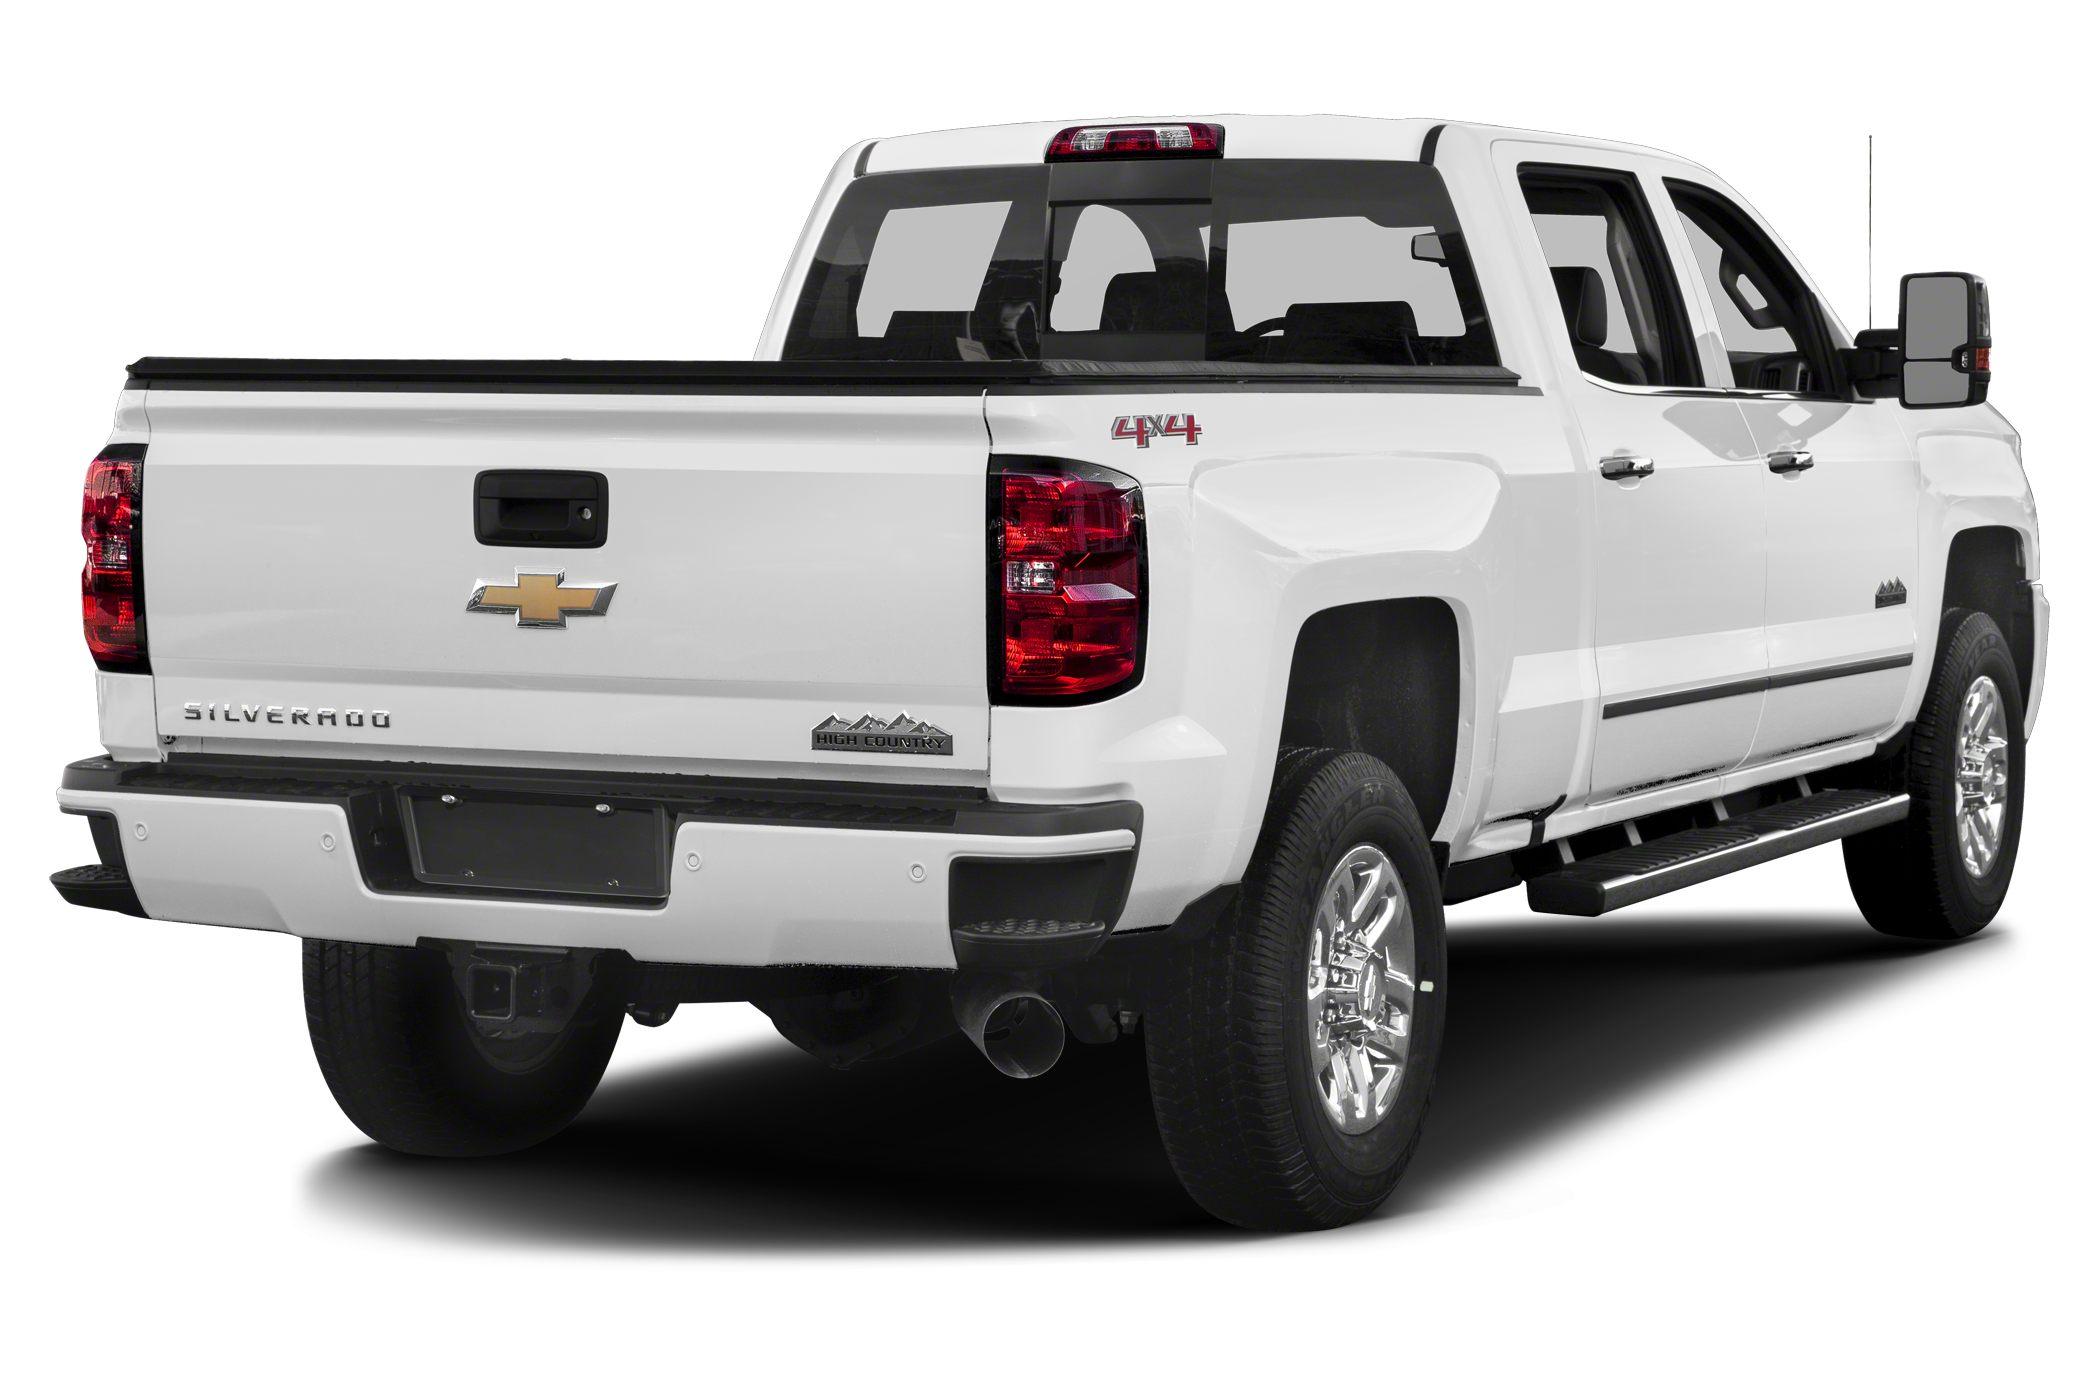 Chevy Silverado Lease Deals >> 2018 Chevrolet Silverado 3500HD Pictures & Photos - CarsDirect